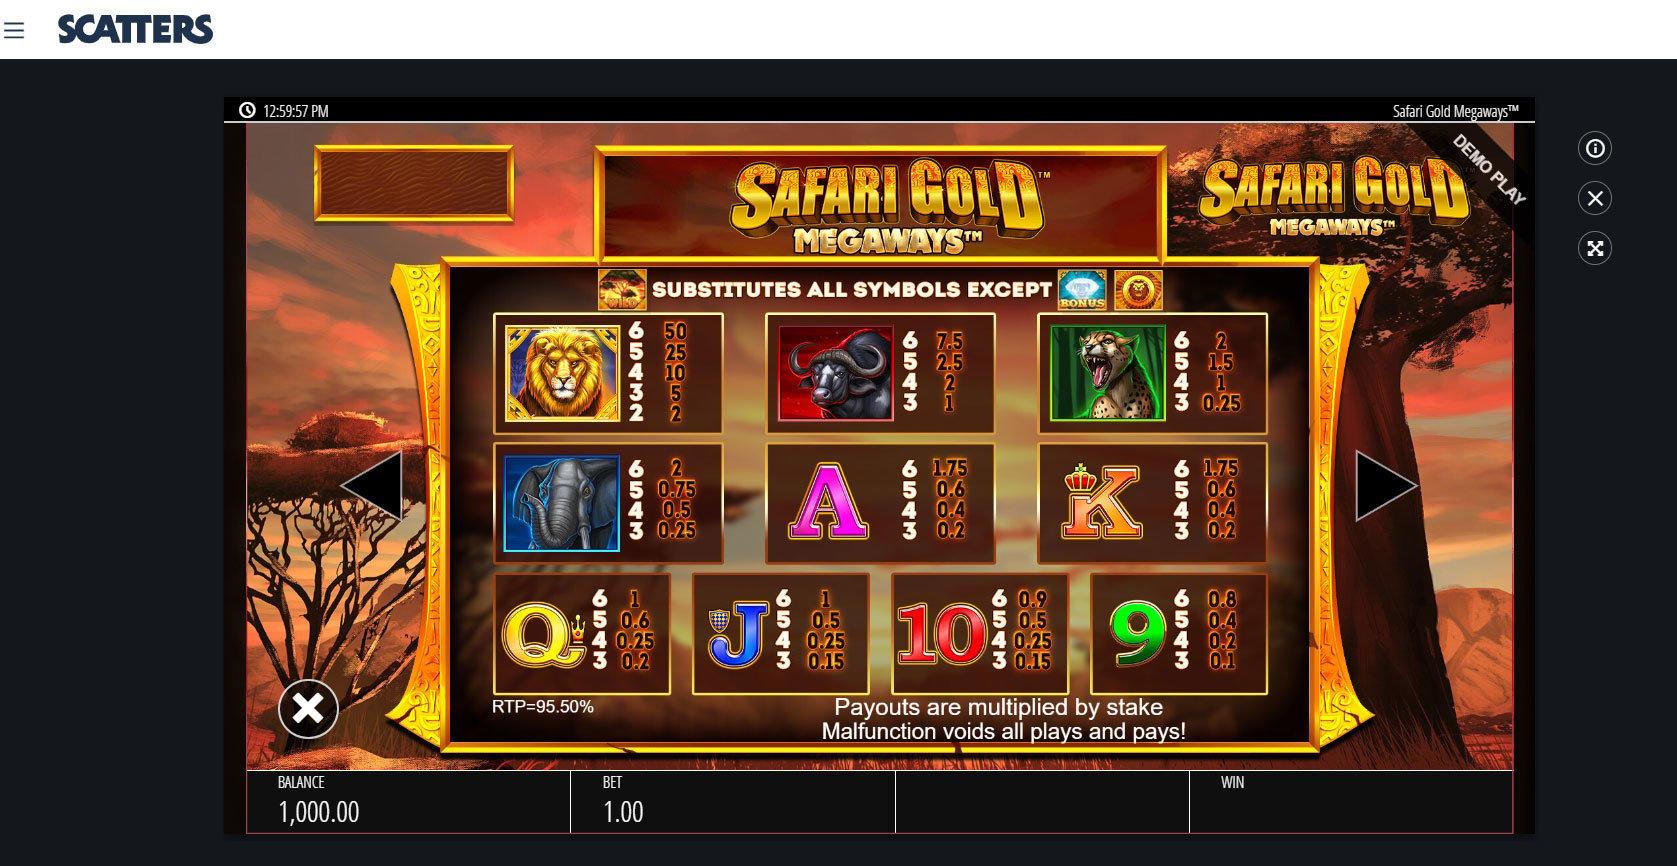 Megaways Slots: Safari Gold - Scatters Online Casino